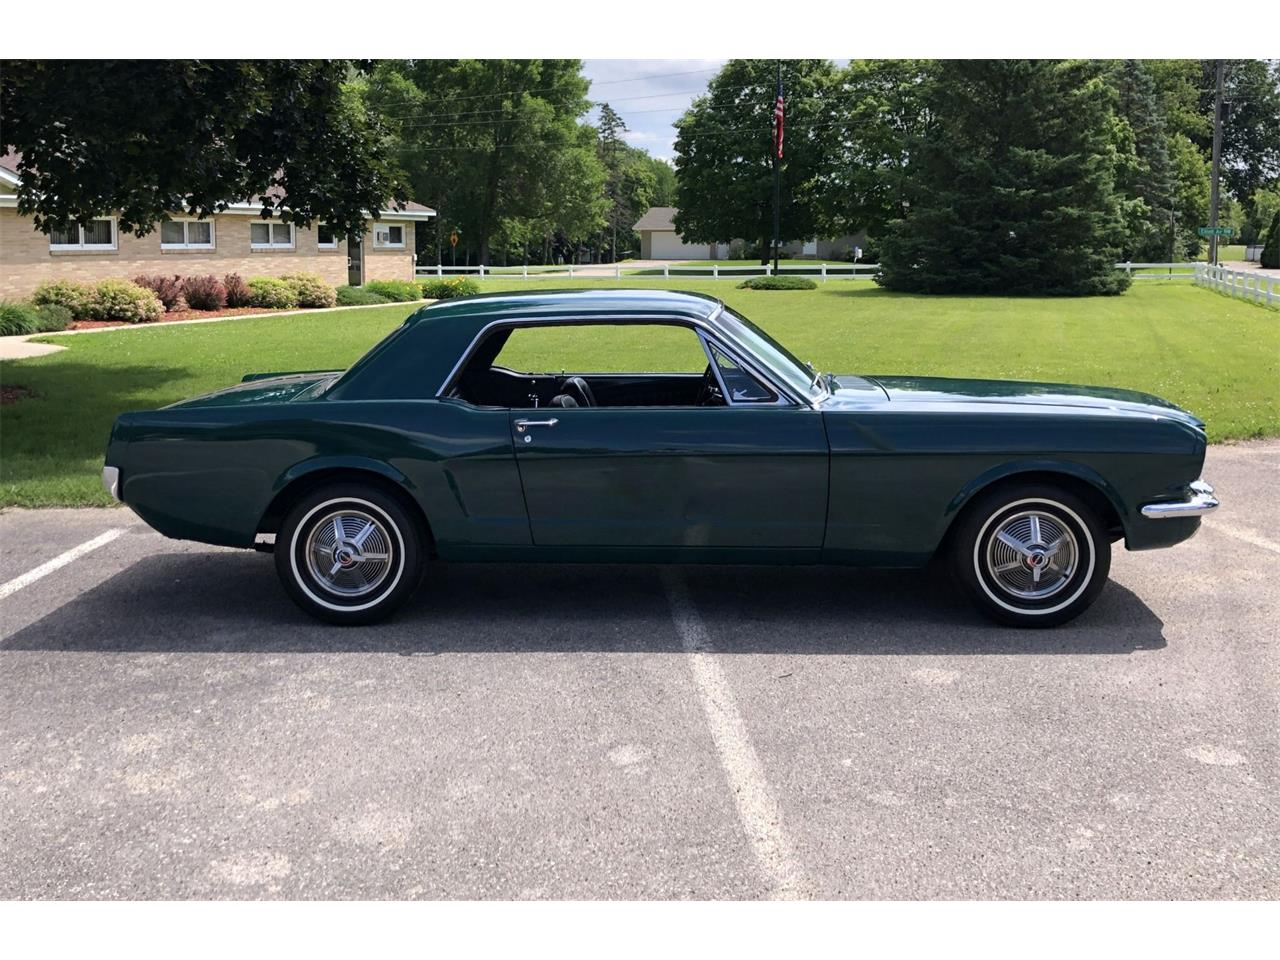 Ford Mustang 1964 prix tout compris 1964